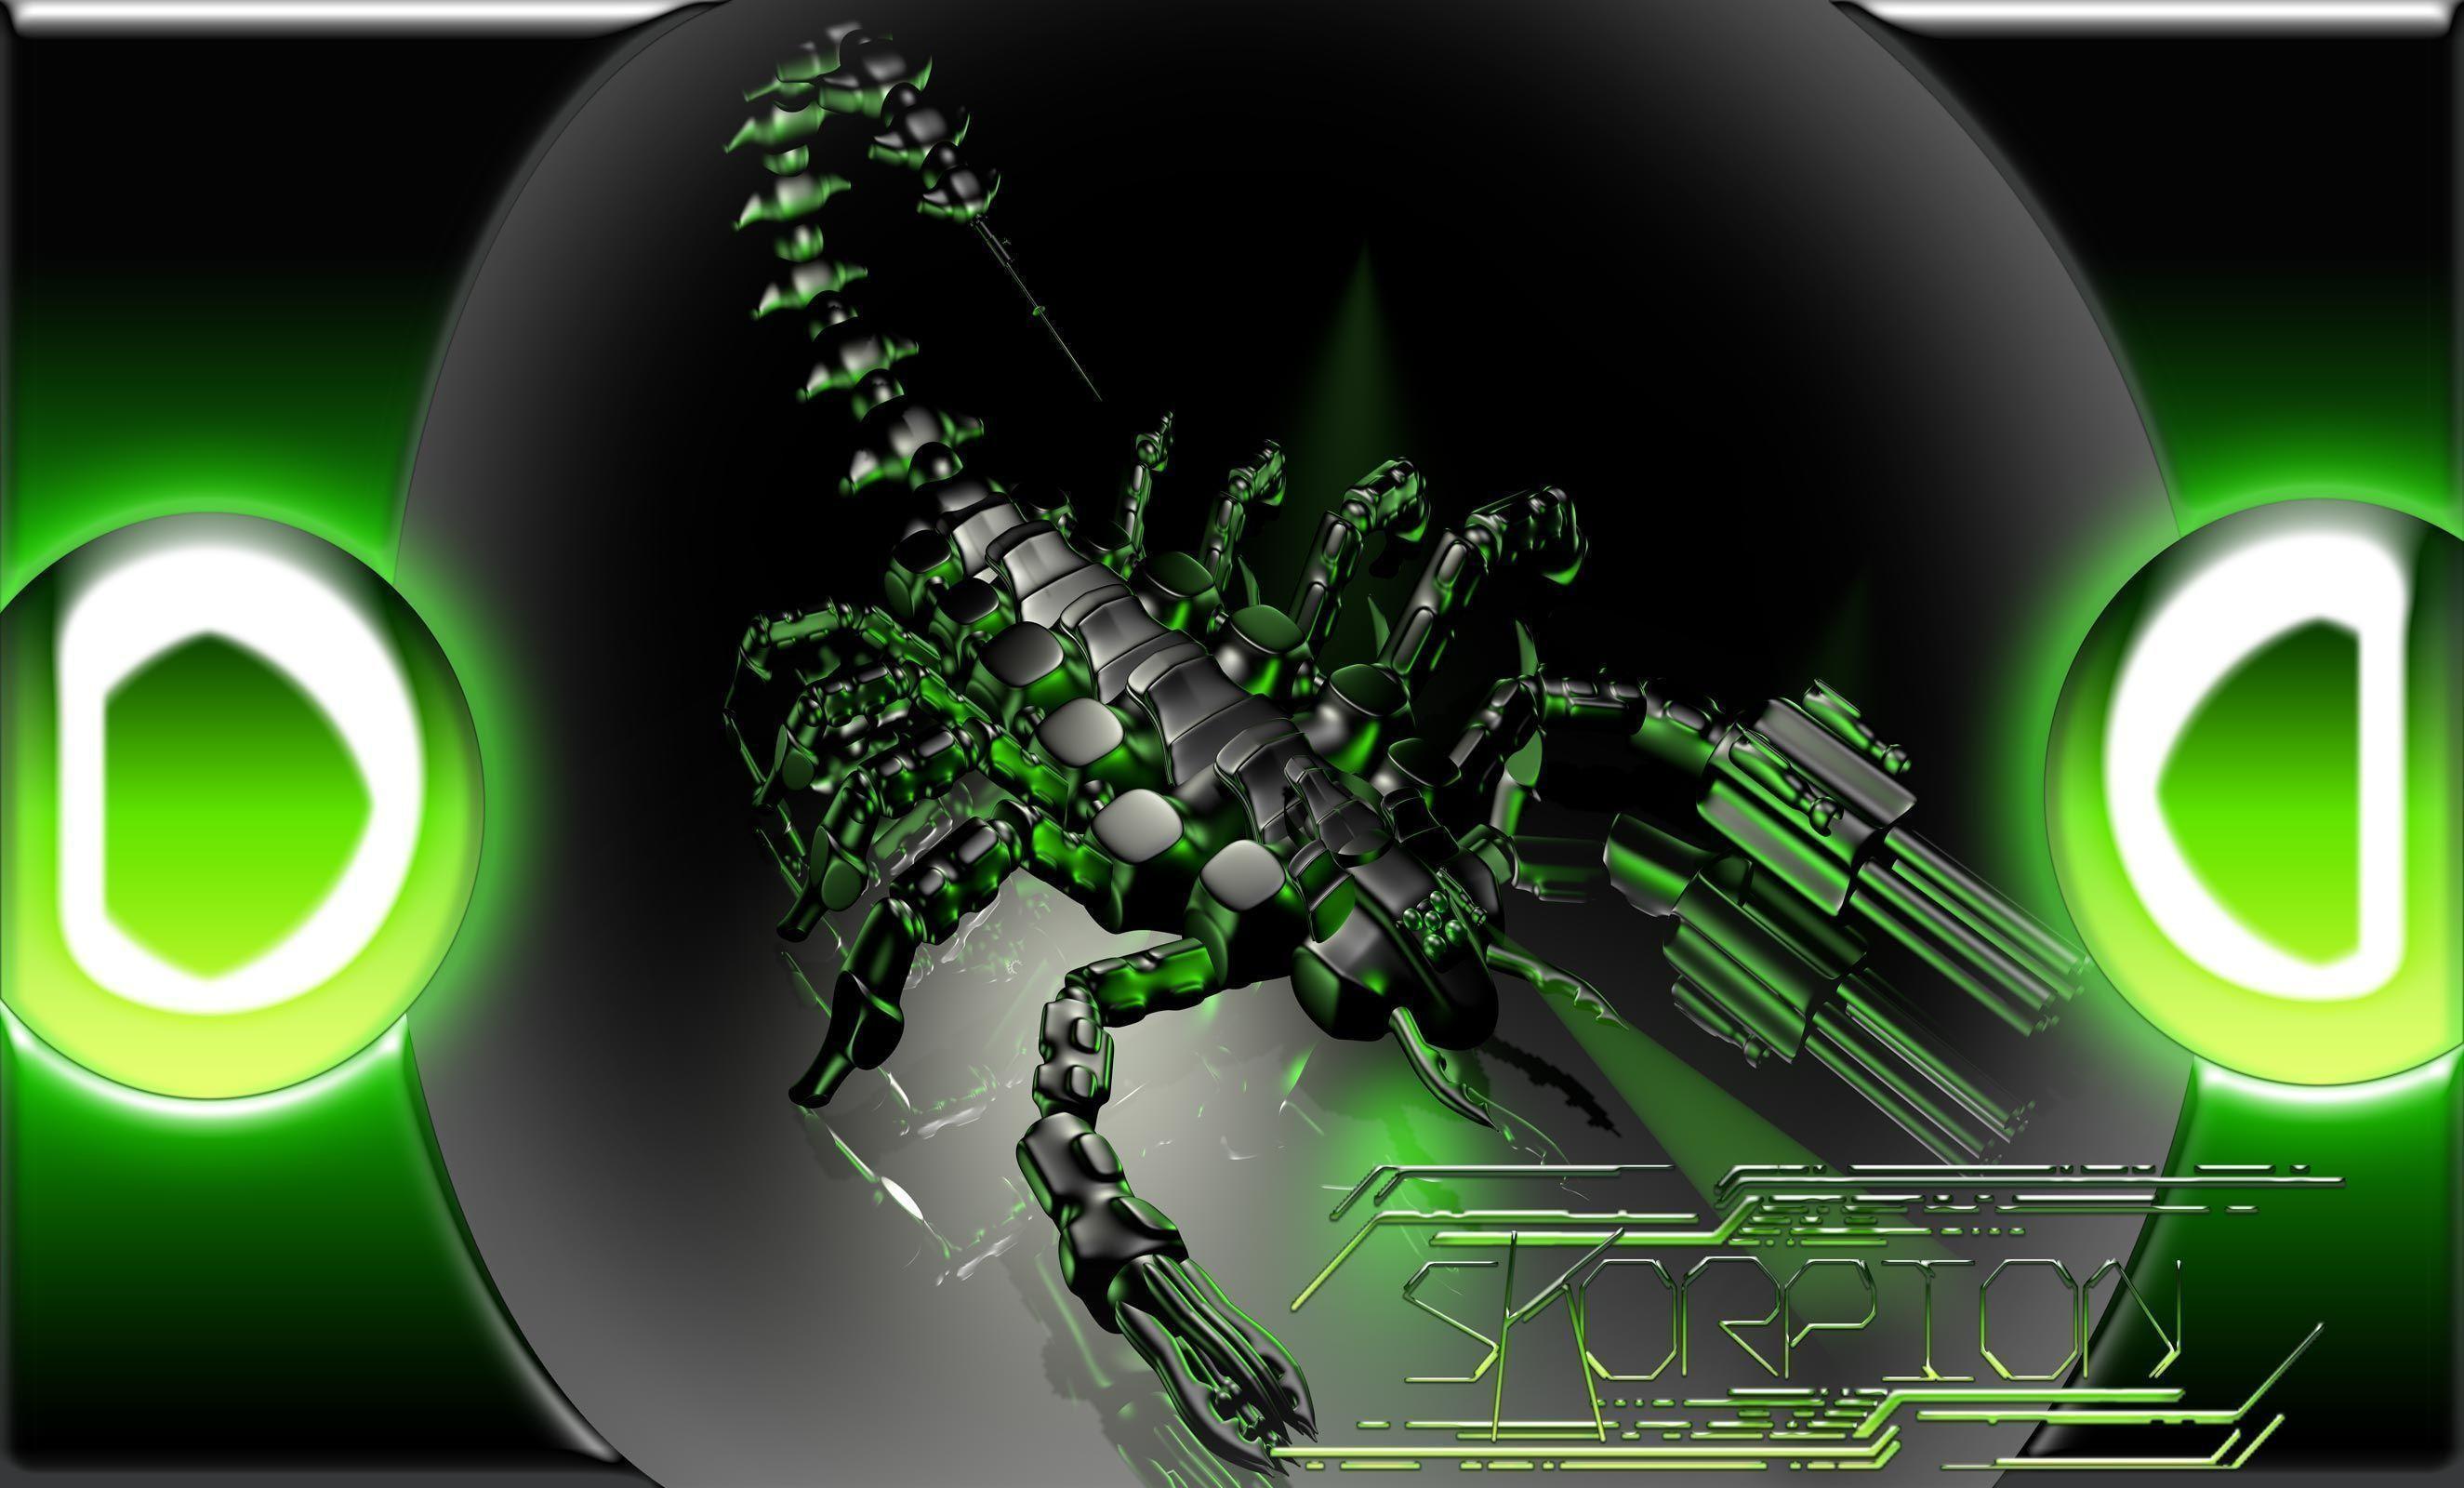 Res: 2650x1600, cyber scorpion Computer Wallpapers, Desktop Backgrounds  .